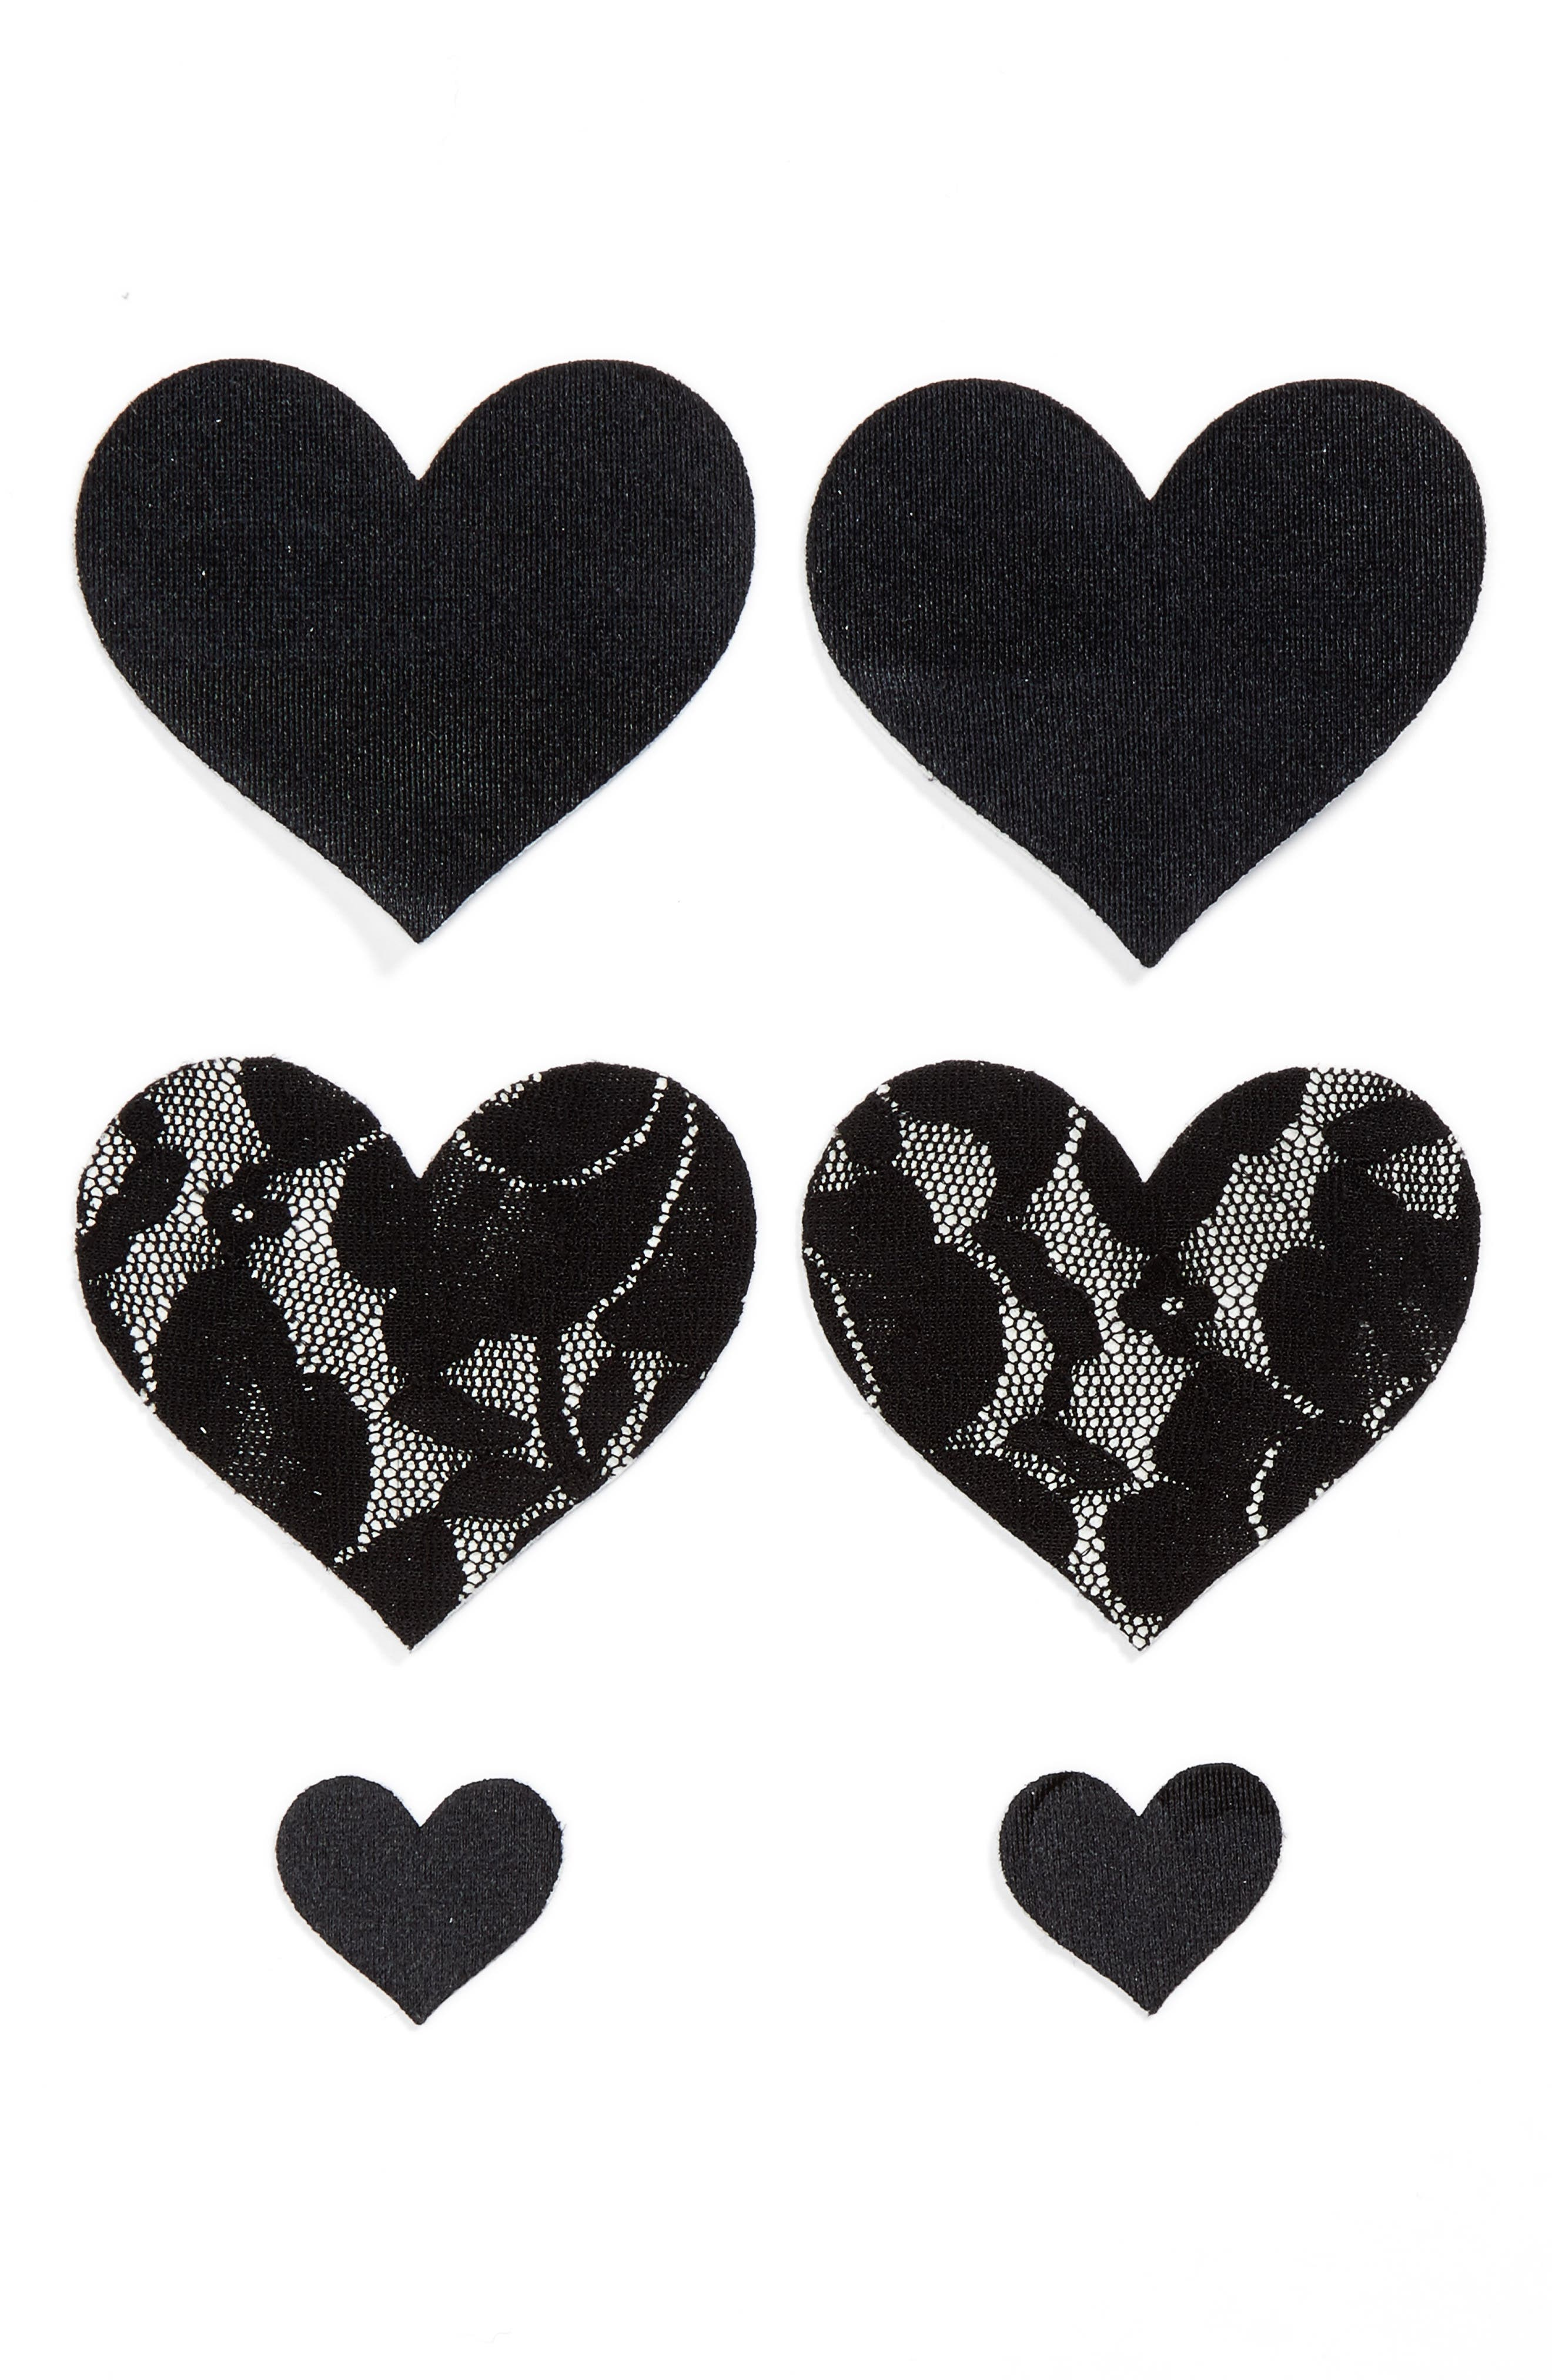 Nippies by Bristols Six Heart Nipple Covers